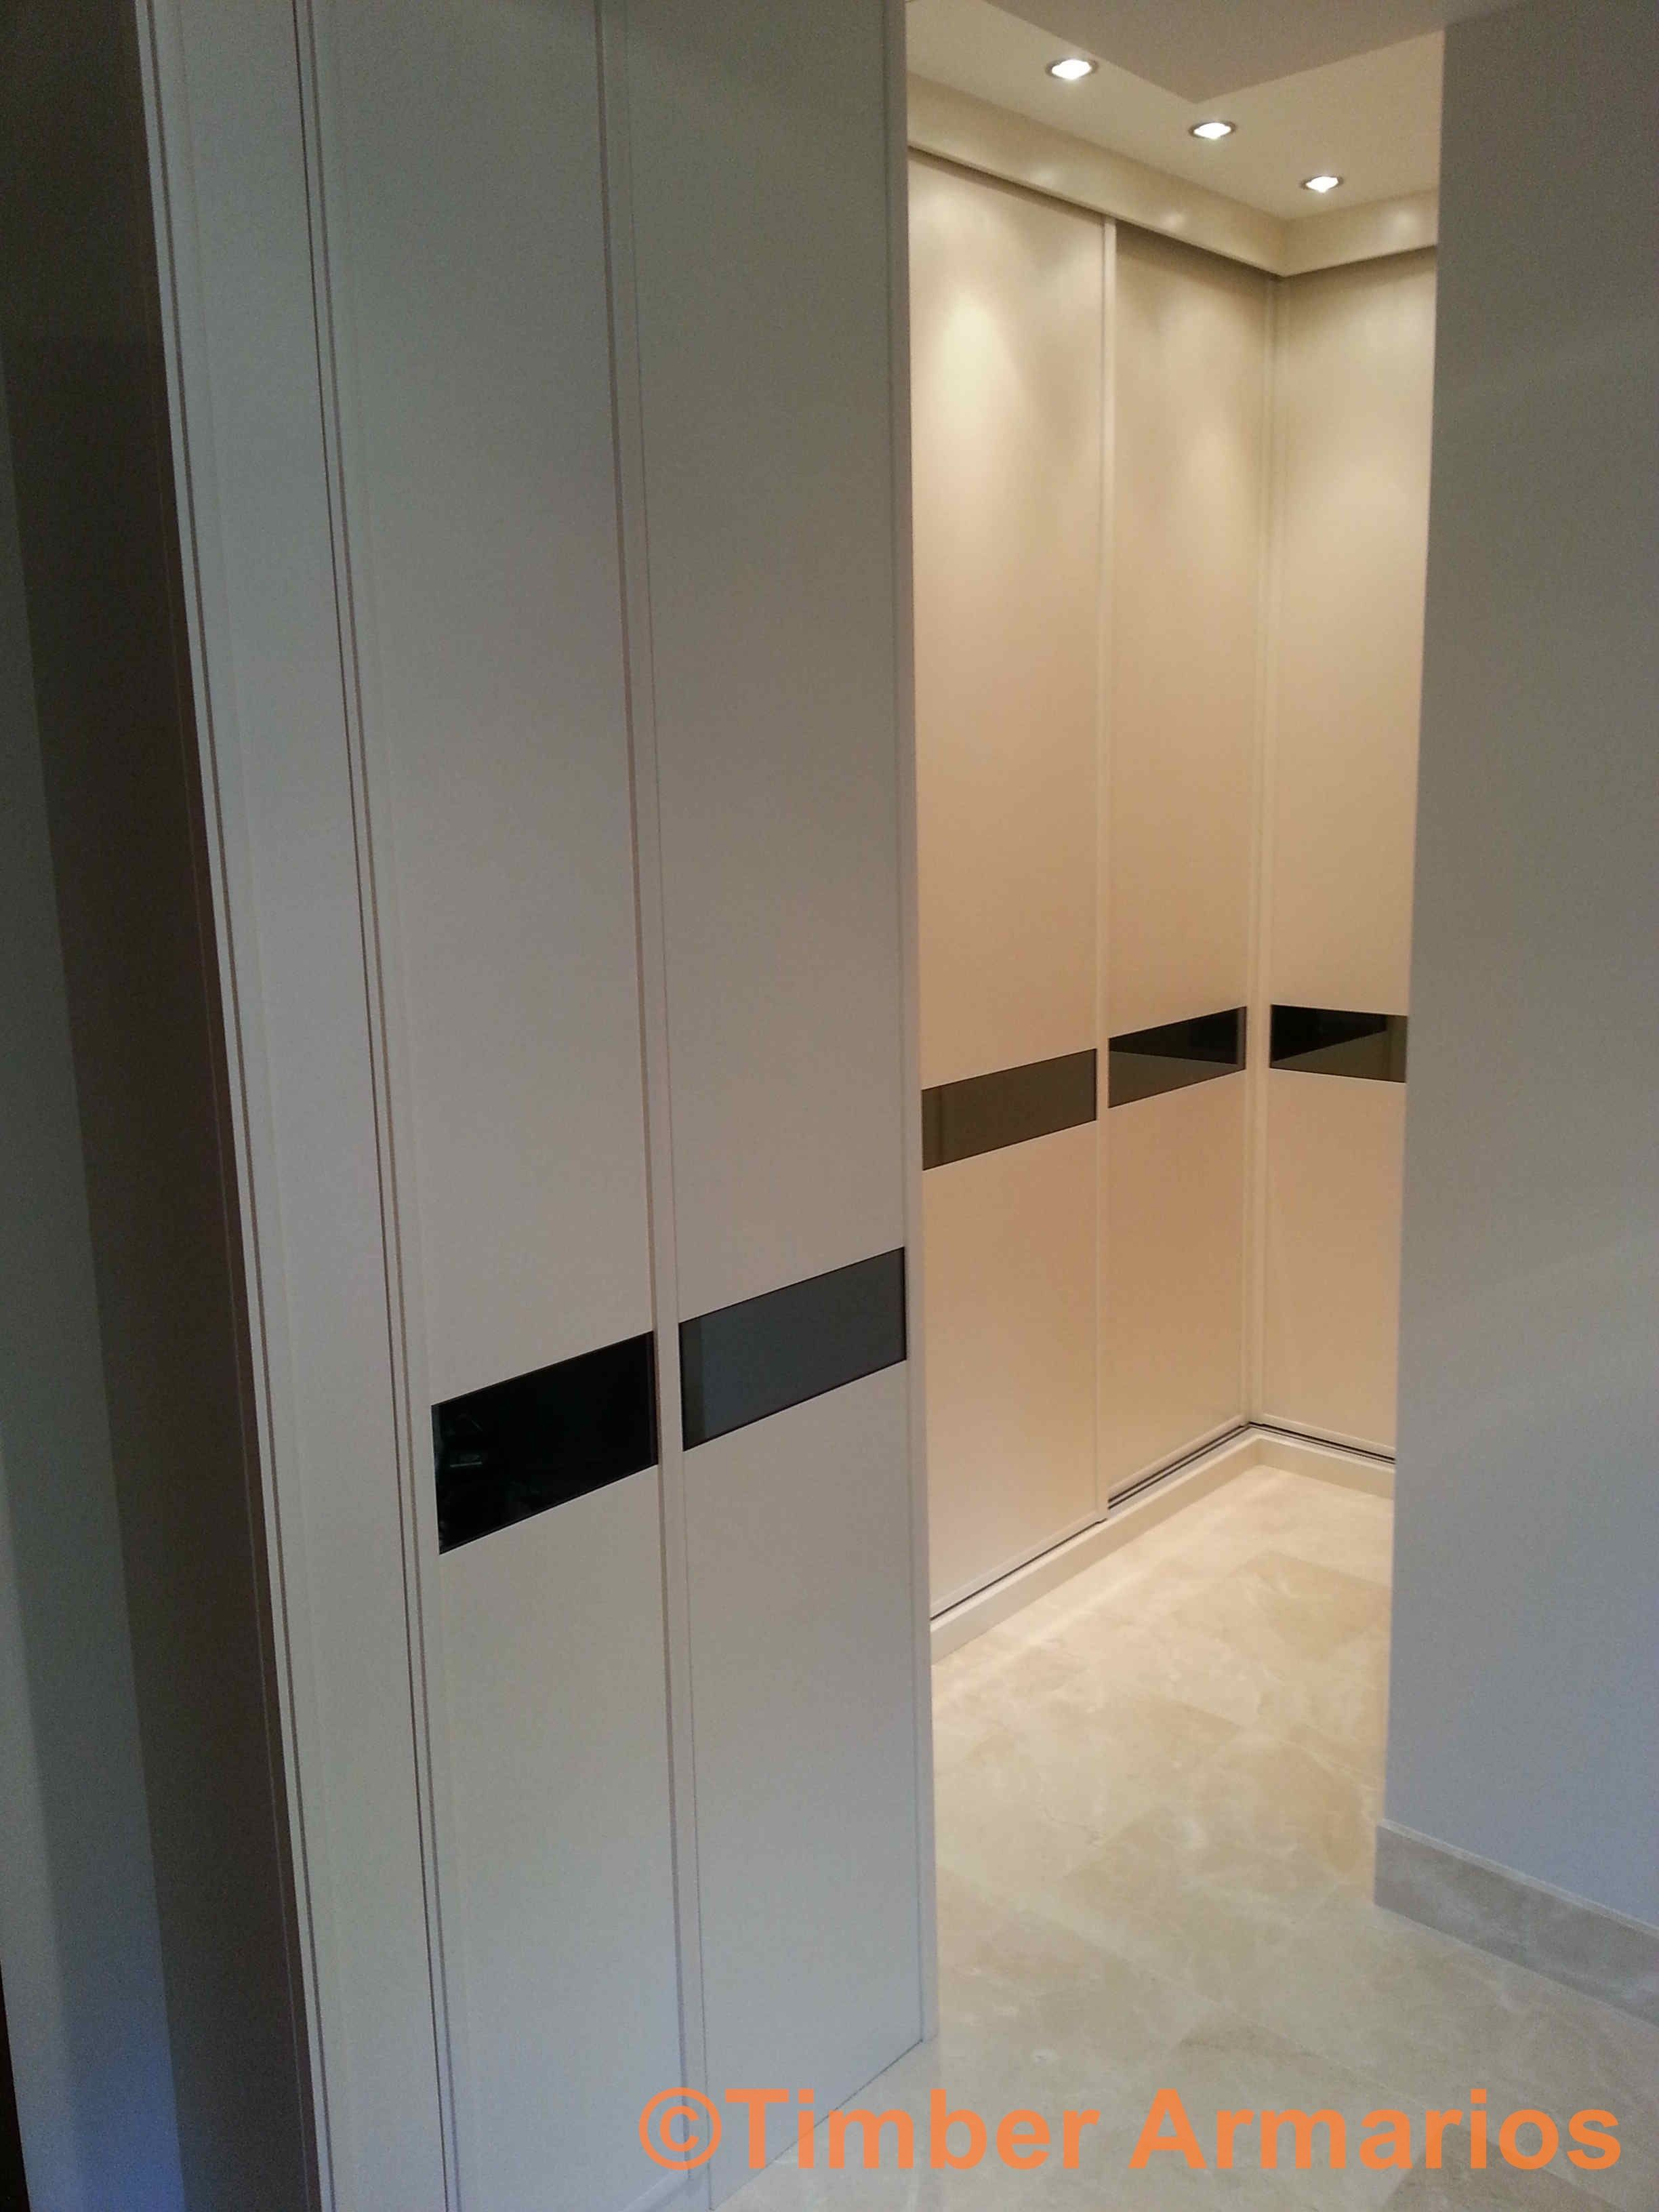 Armario para terraza armarios para terrazas foto puerta for Precio armario aluminio terraza